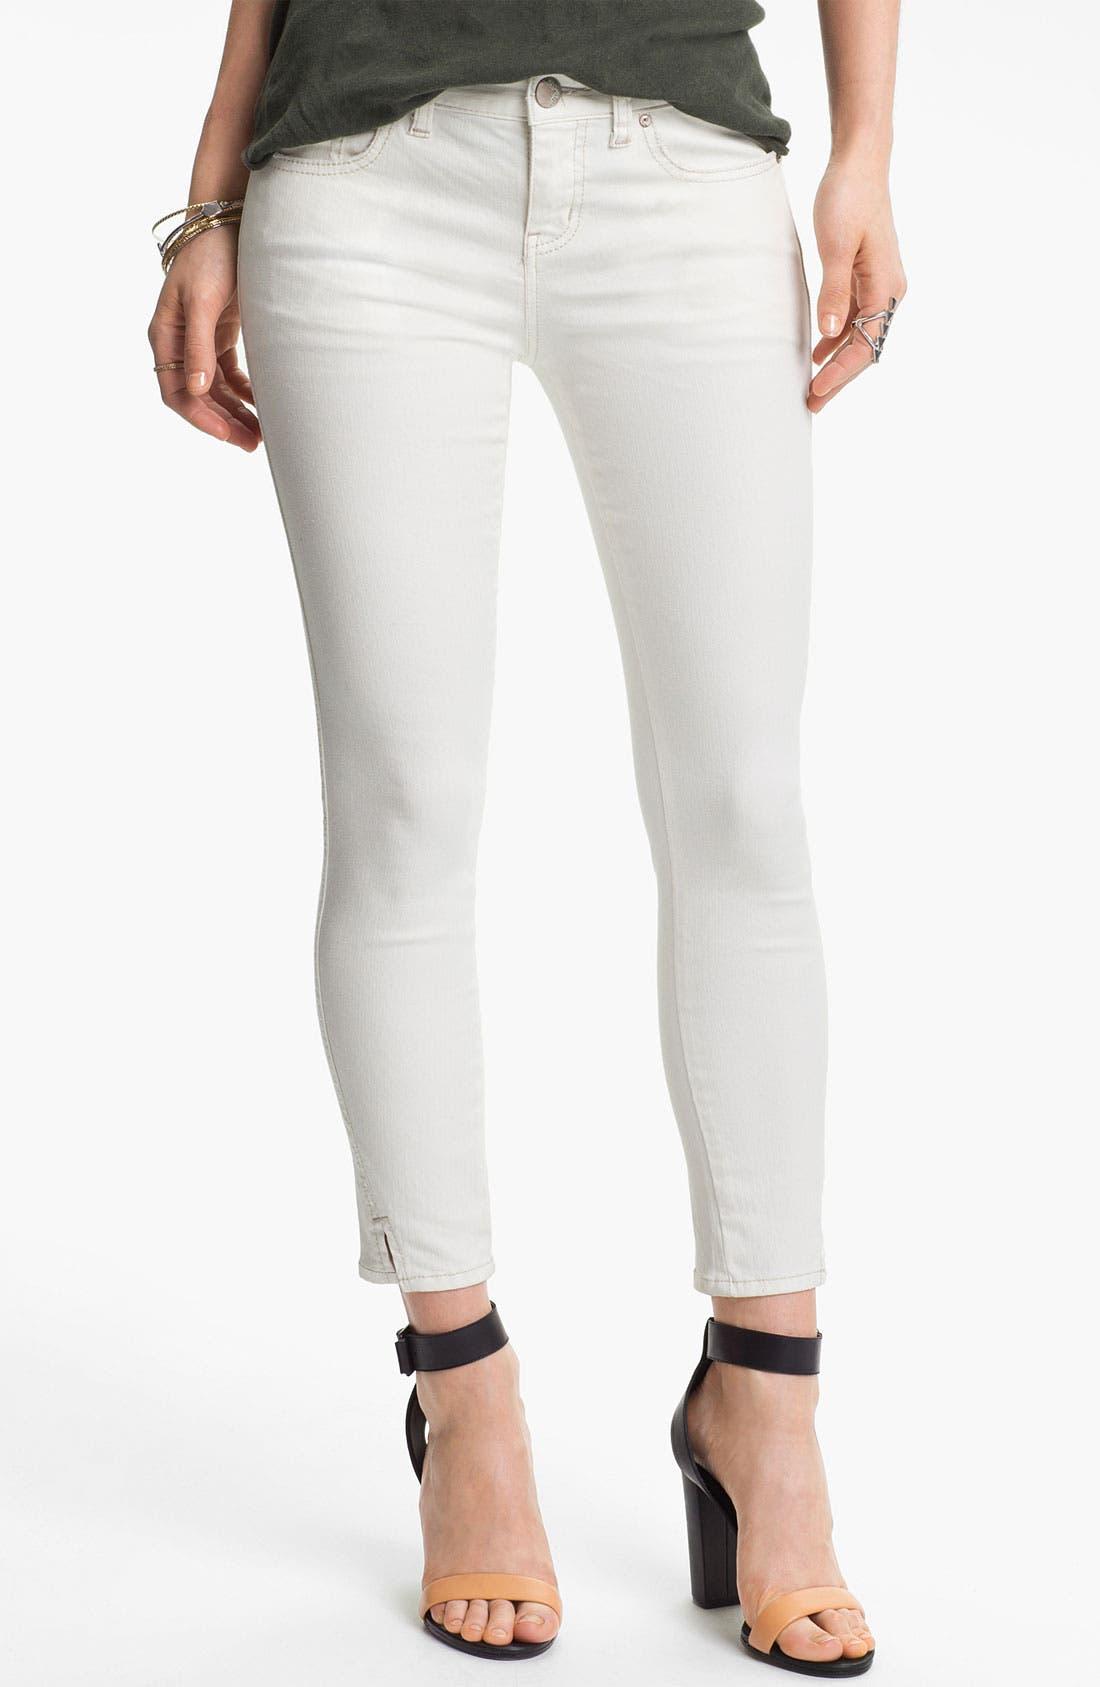 Alternate Image 1 Selected - Free People Crop Stretch Denim Skinny Jeans (White)